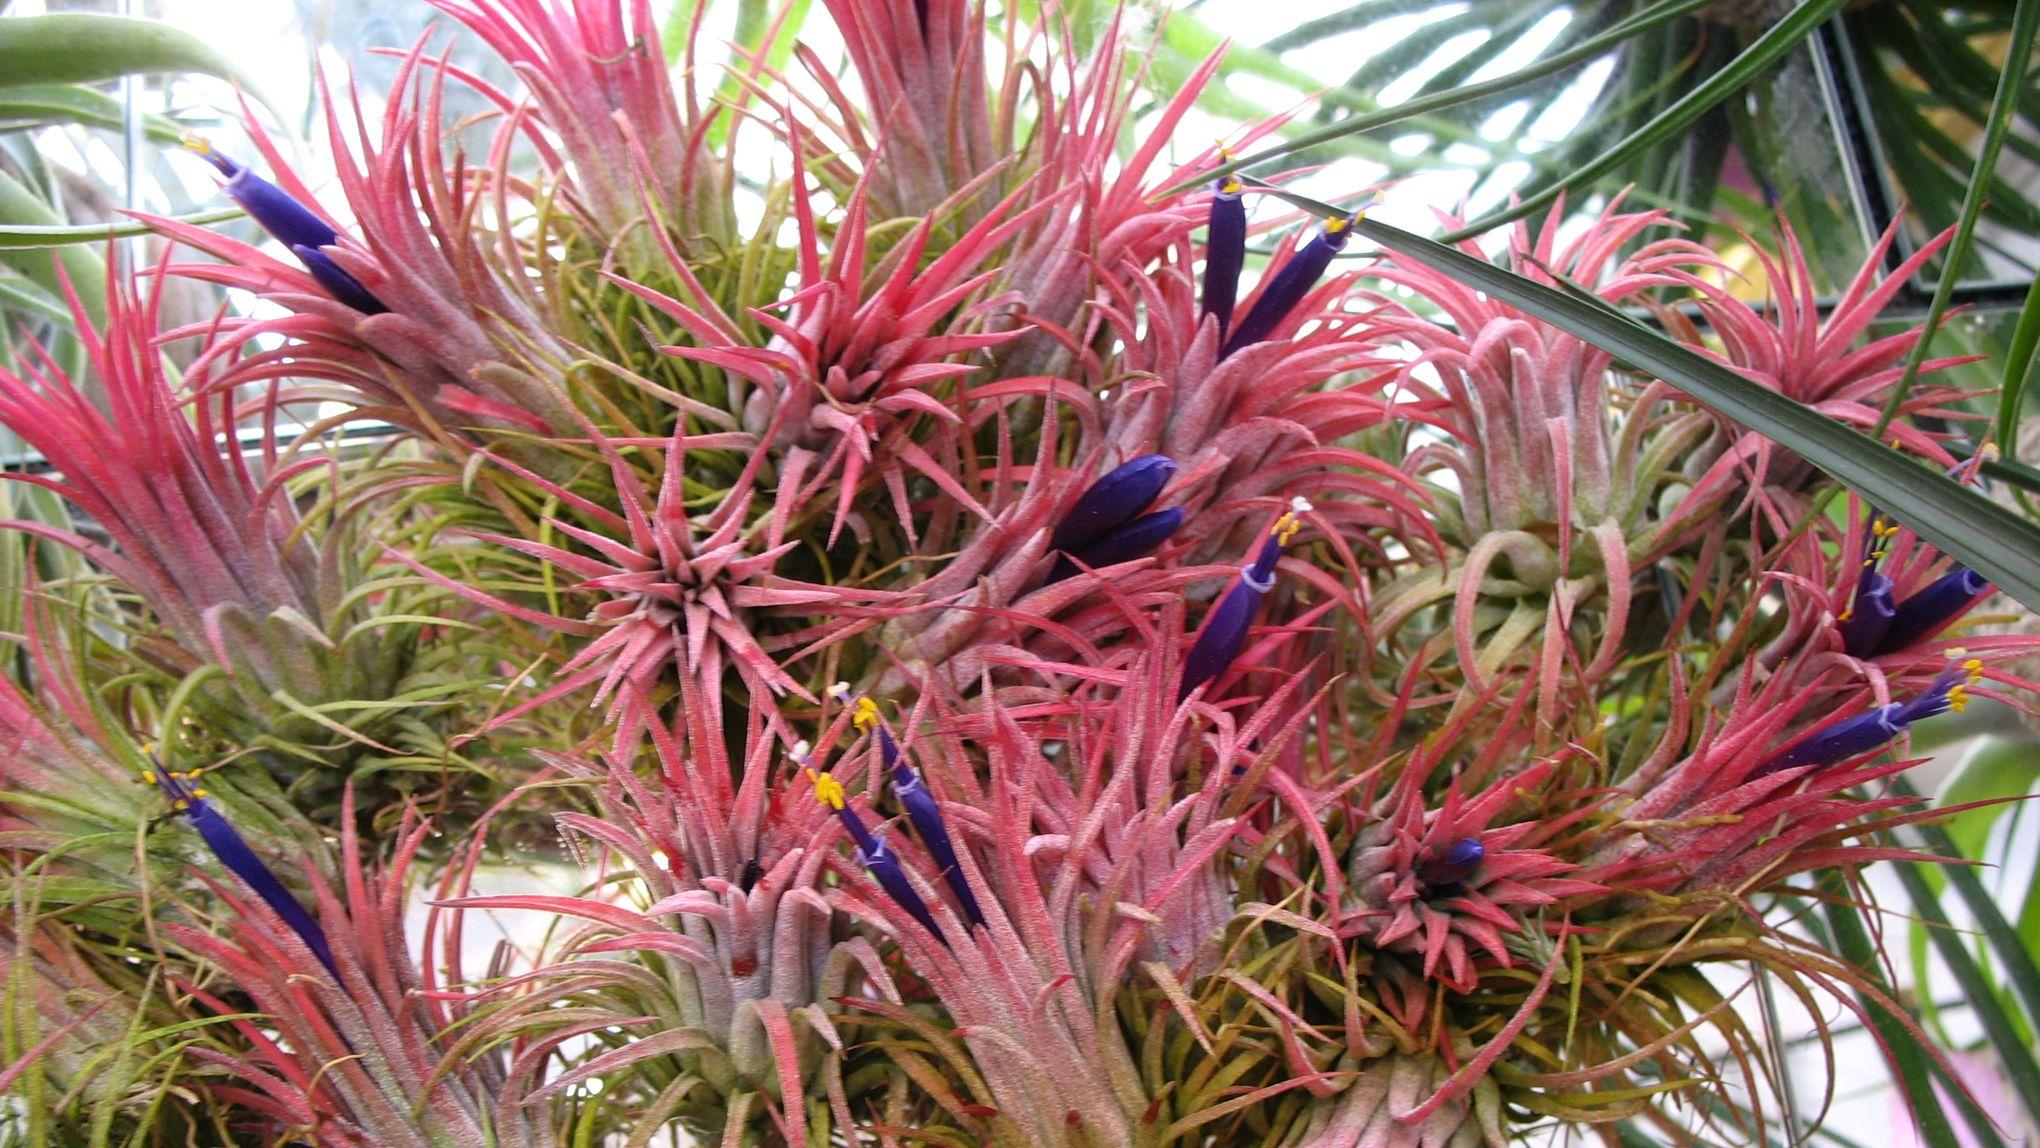 Les Filles De L Air Plante tillandsias: des «filles de l'air» cousines de l'ananas